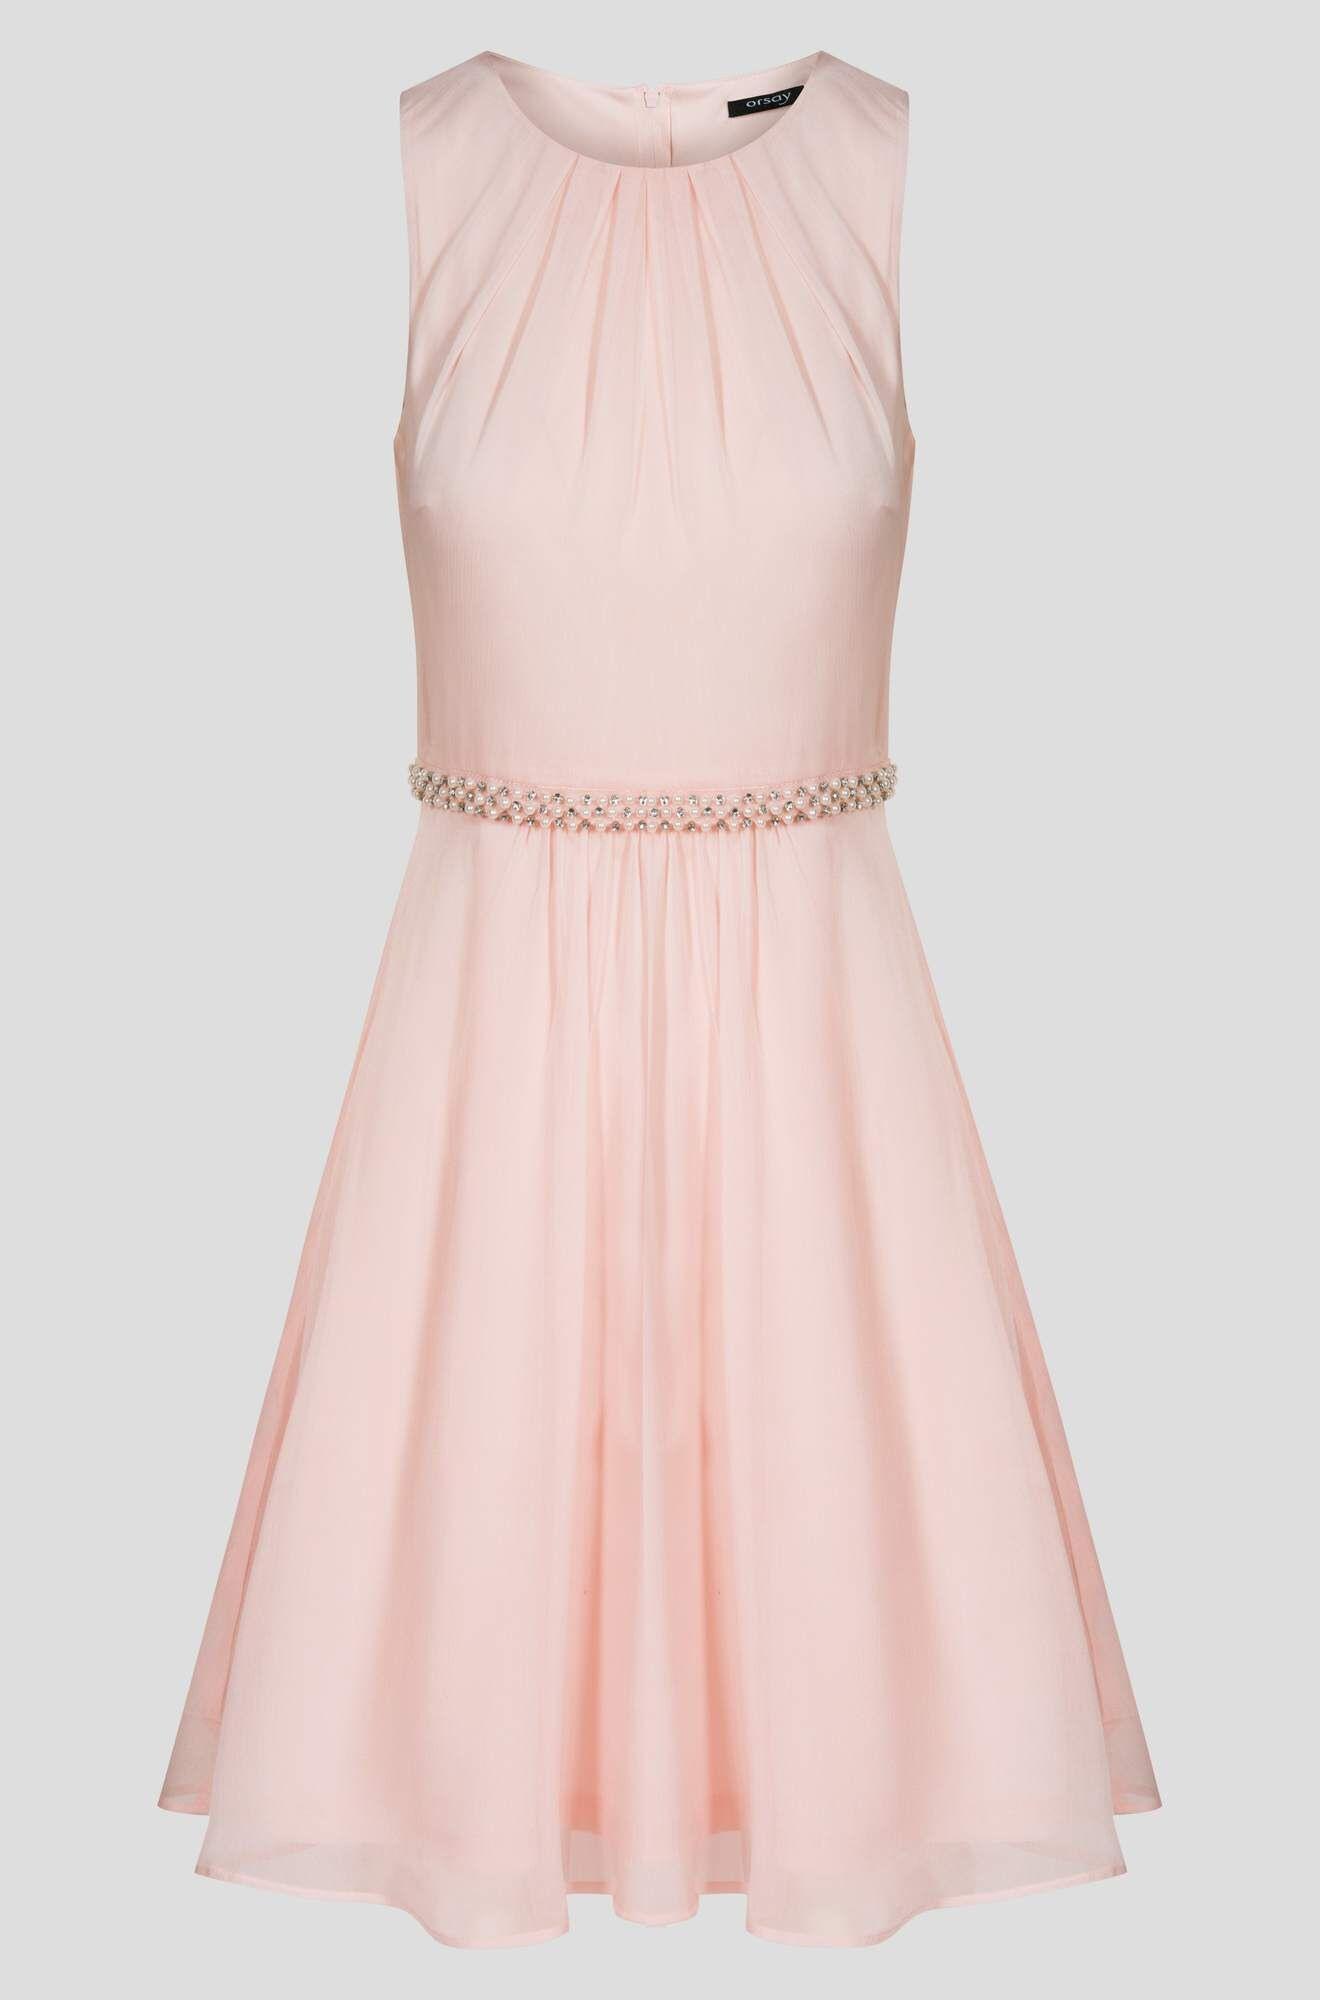 17 Luxurius Orsay Abendkleid Boutique - Abendkleid